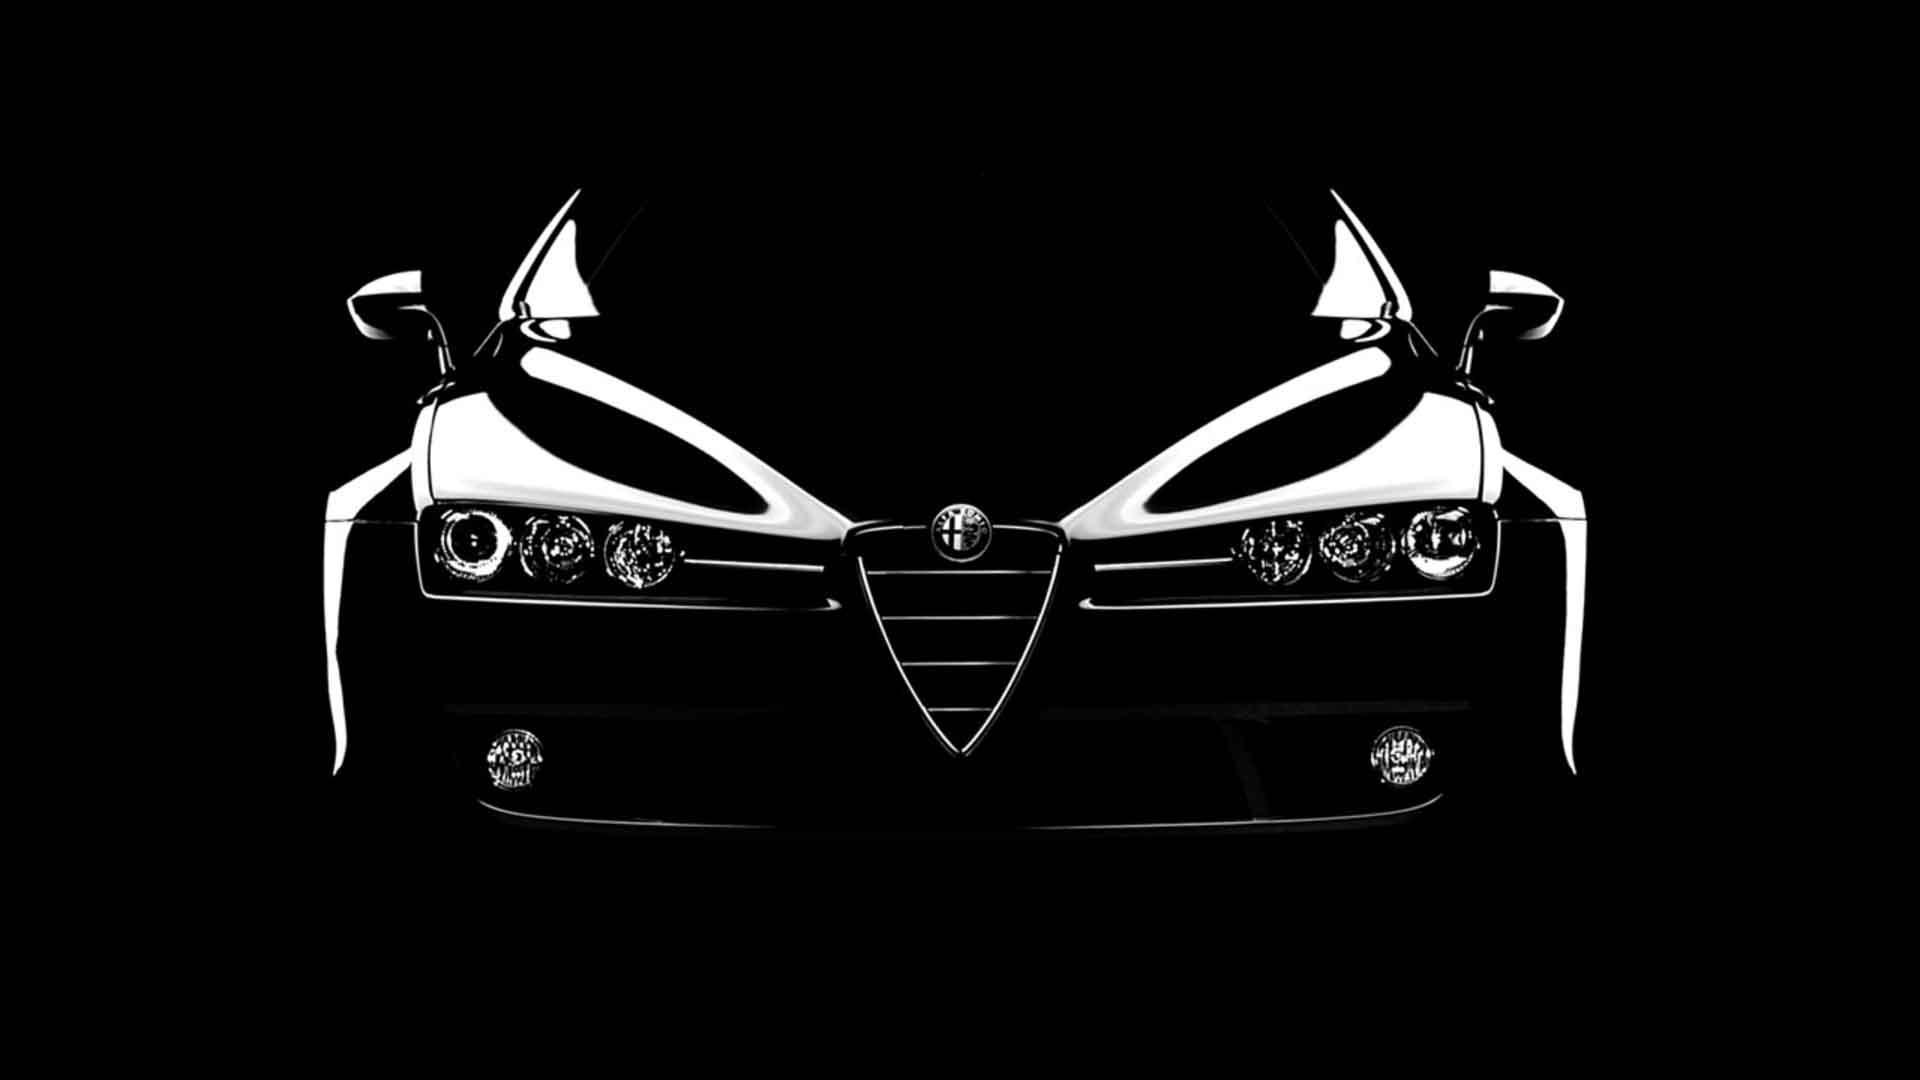 Ultra HD Alfa Romeo Wallpapers 32434RB   4USkY 1920x1080